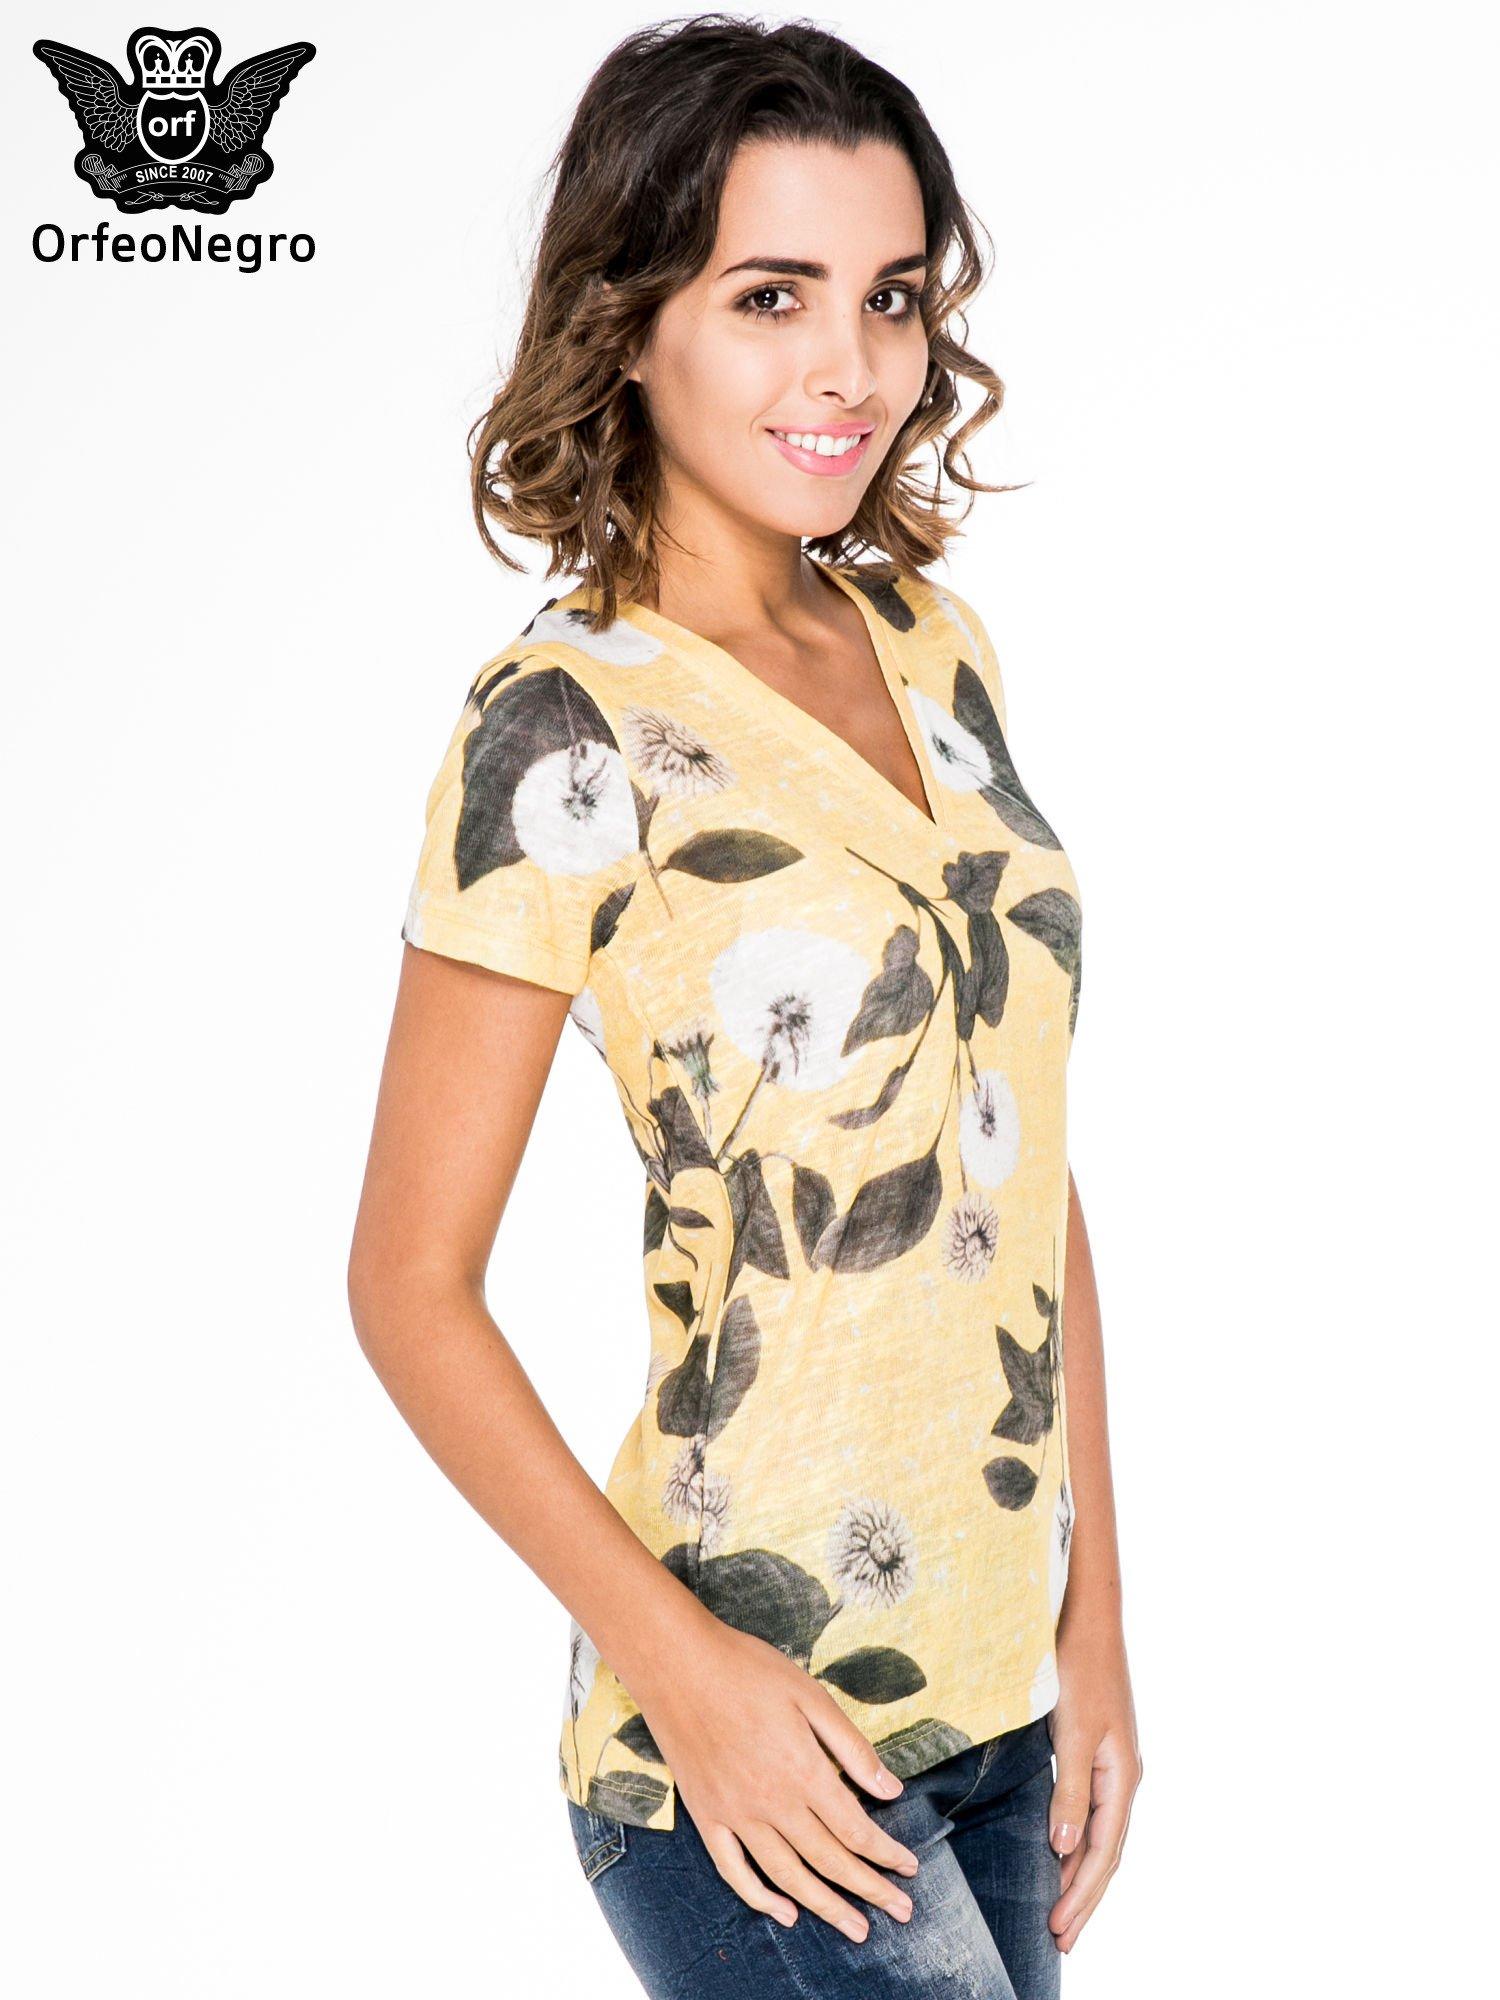 Żółty t-shirt z nadrukiem all over floral print                                  zdj.                                  3